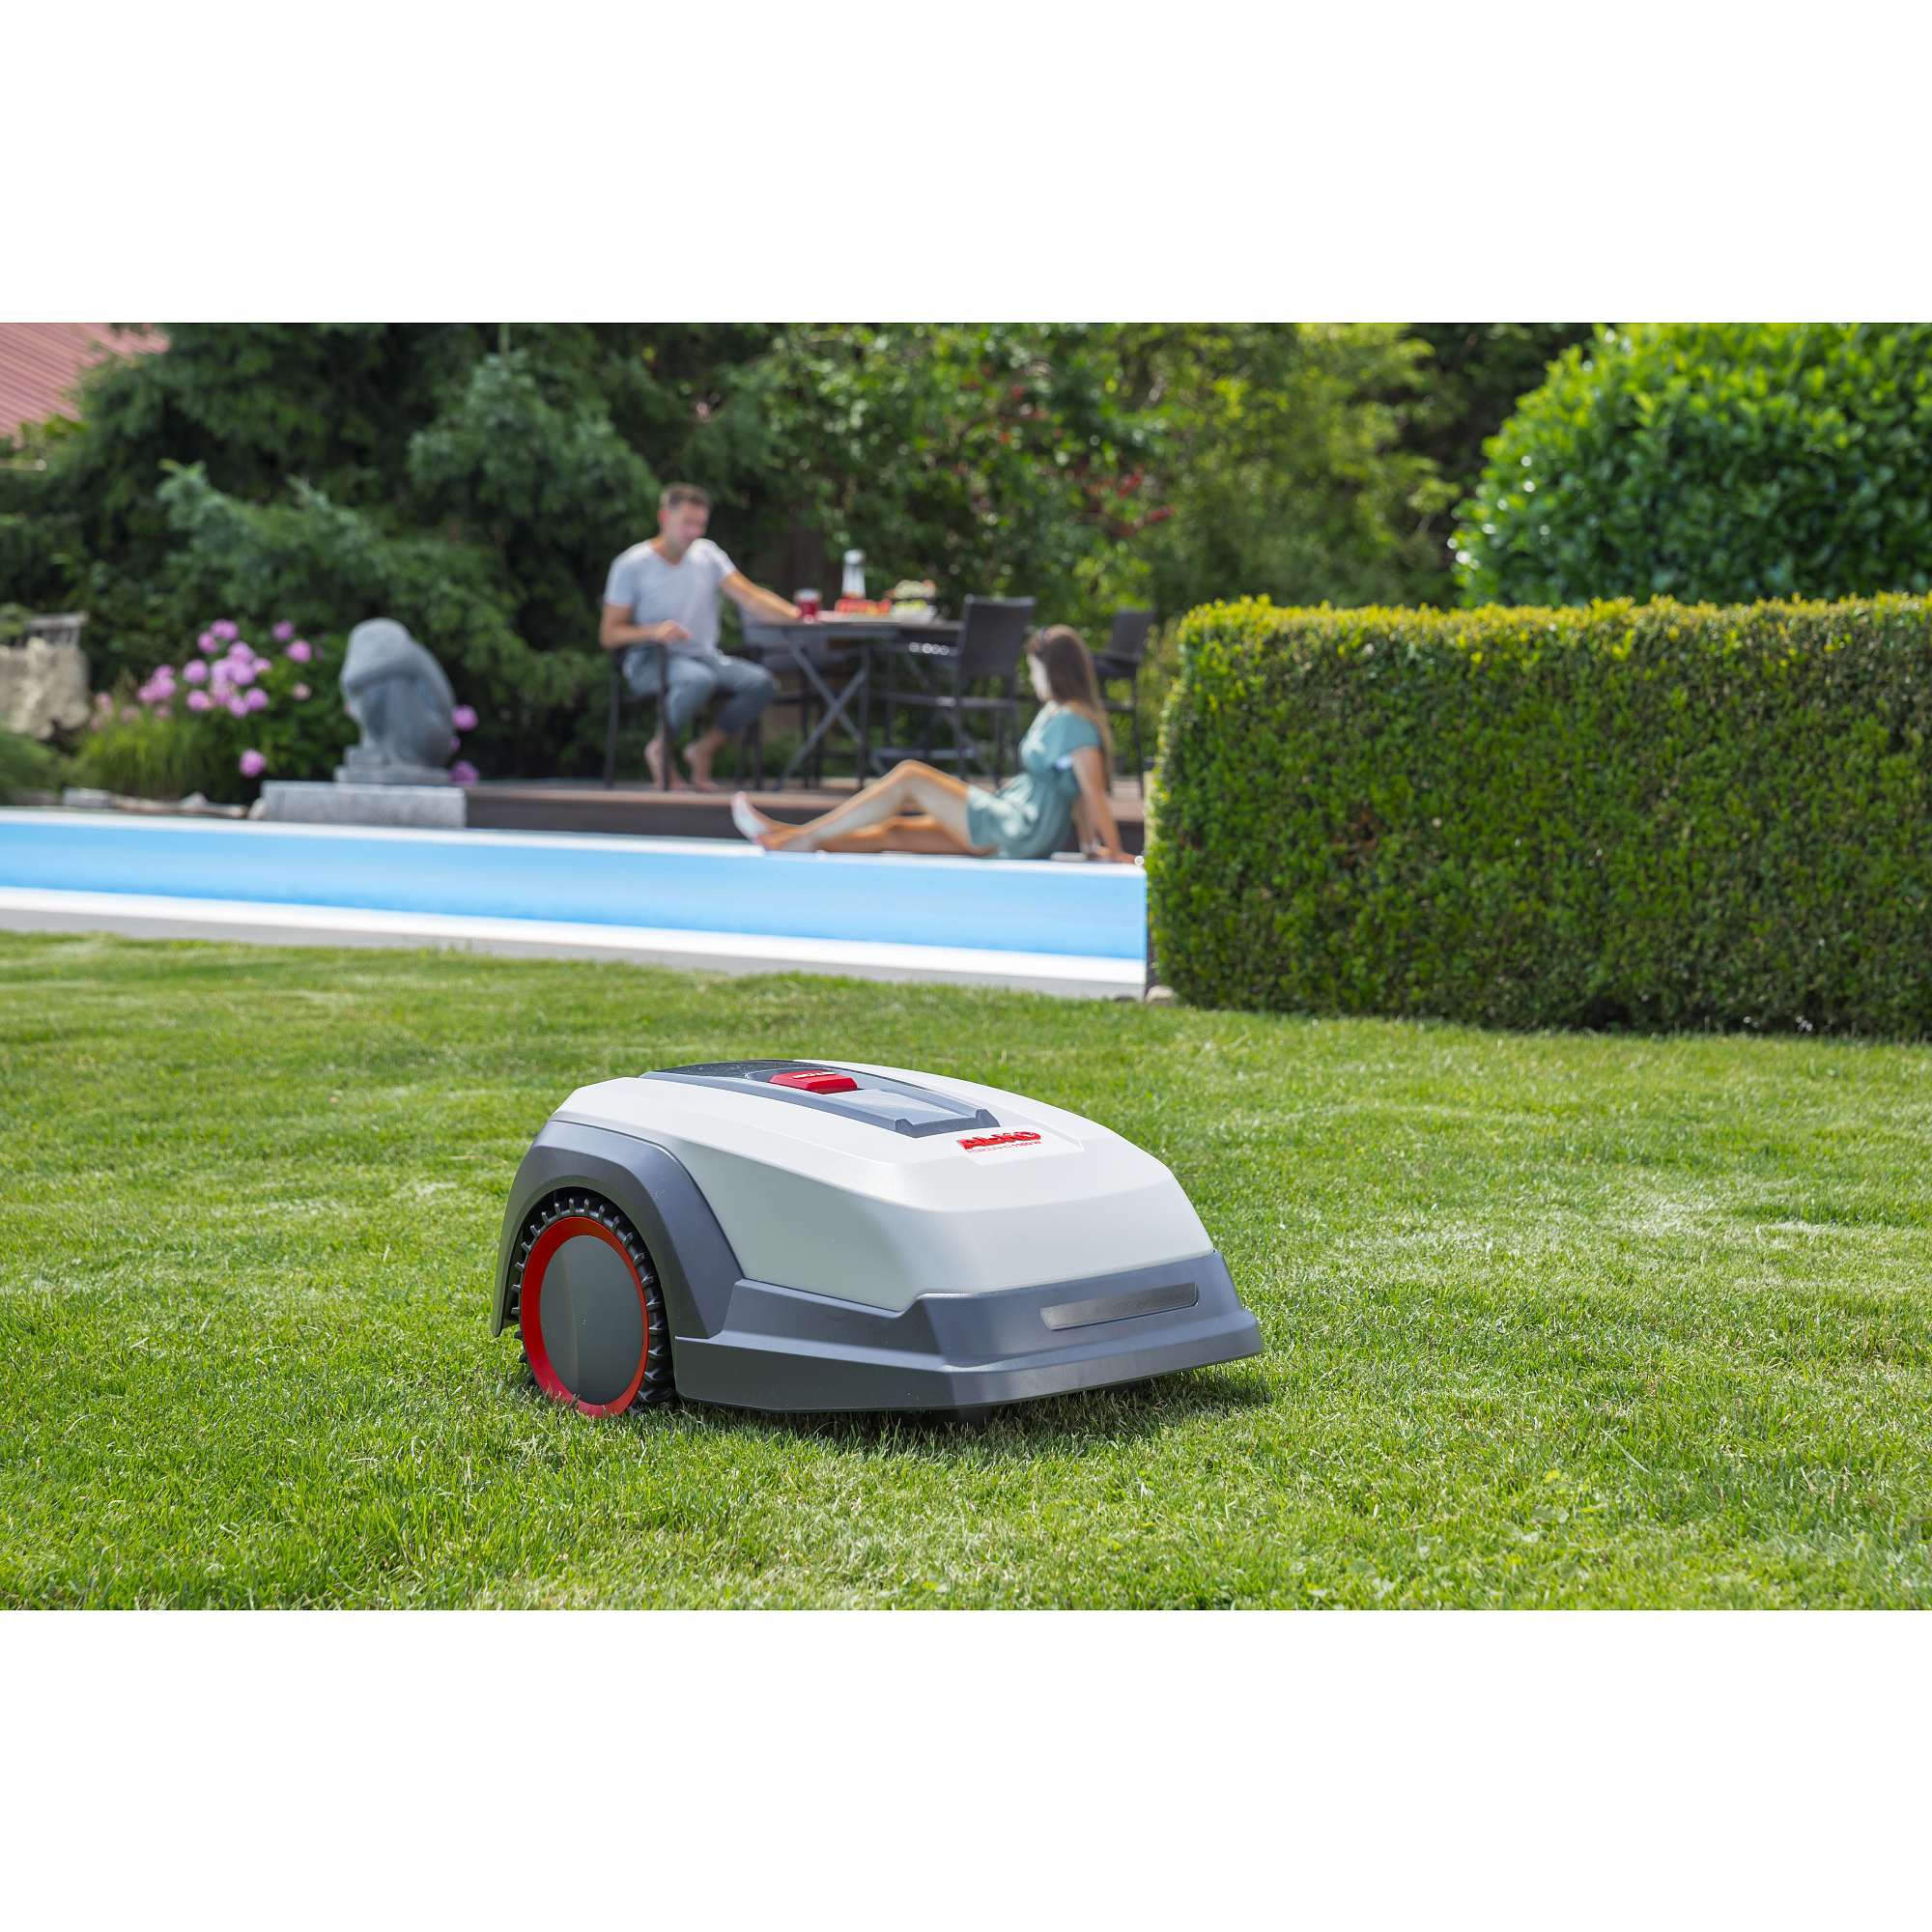 AL-KO Robotfűnyíró Robolinho 1150 W 119965